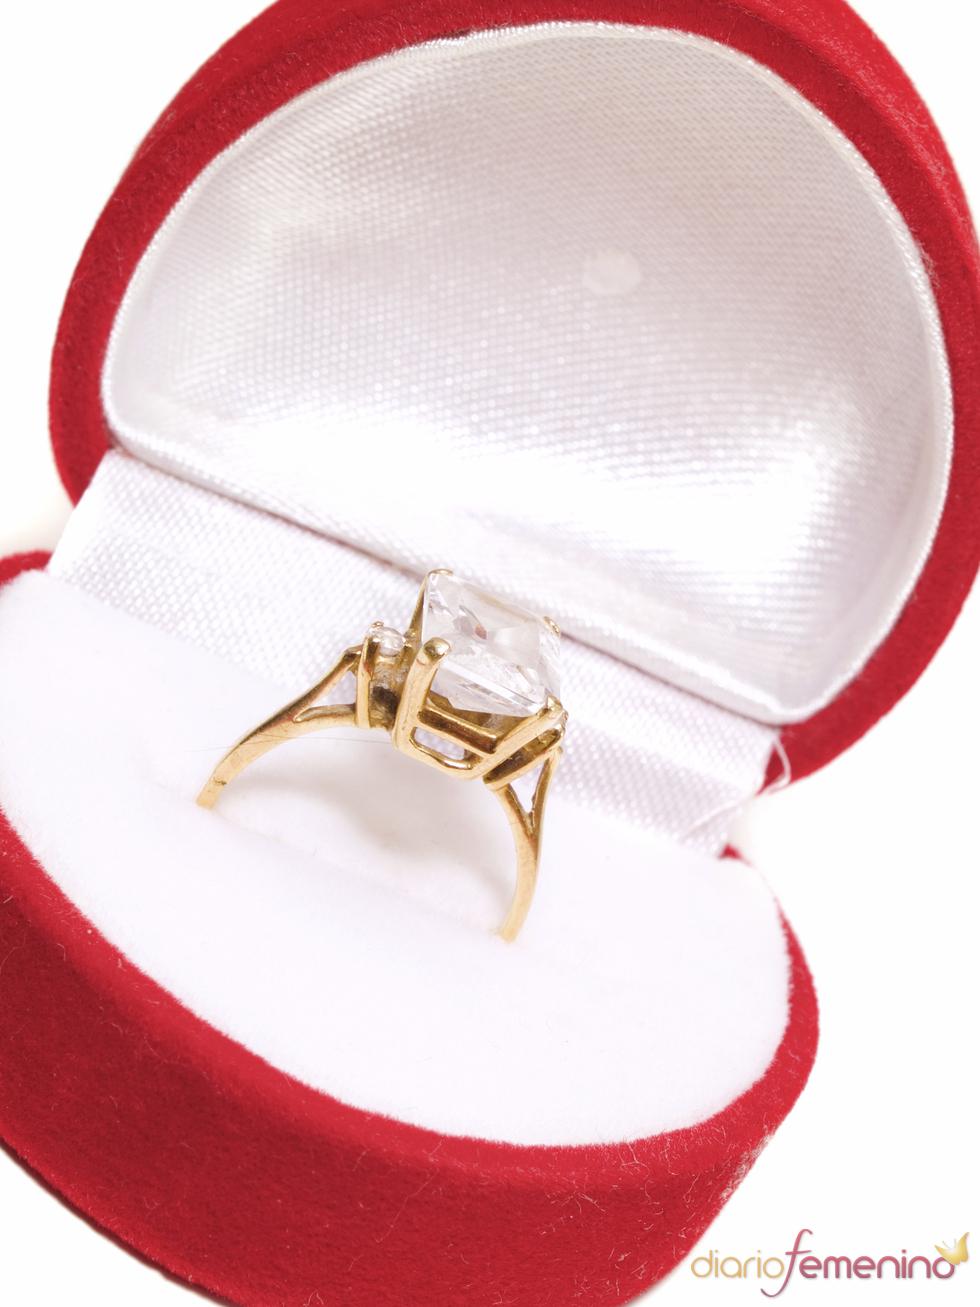 Anillo de compromiso bañado en oro con un diamante cuadrado